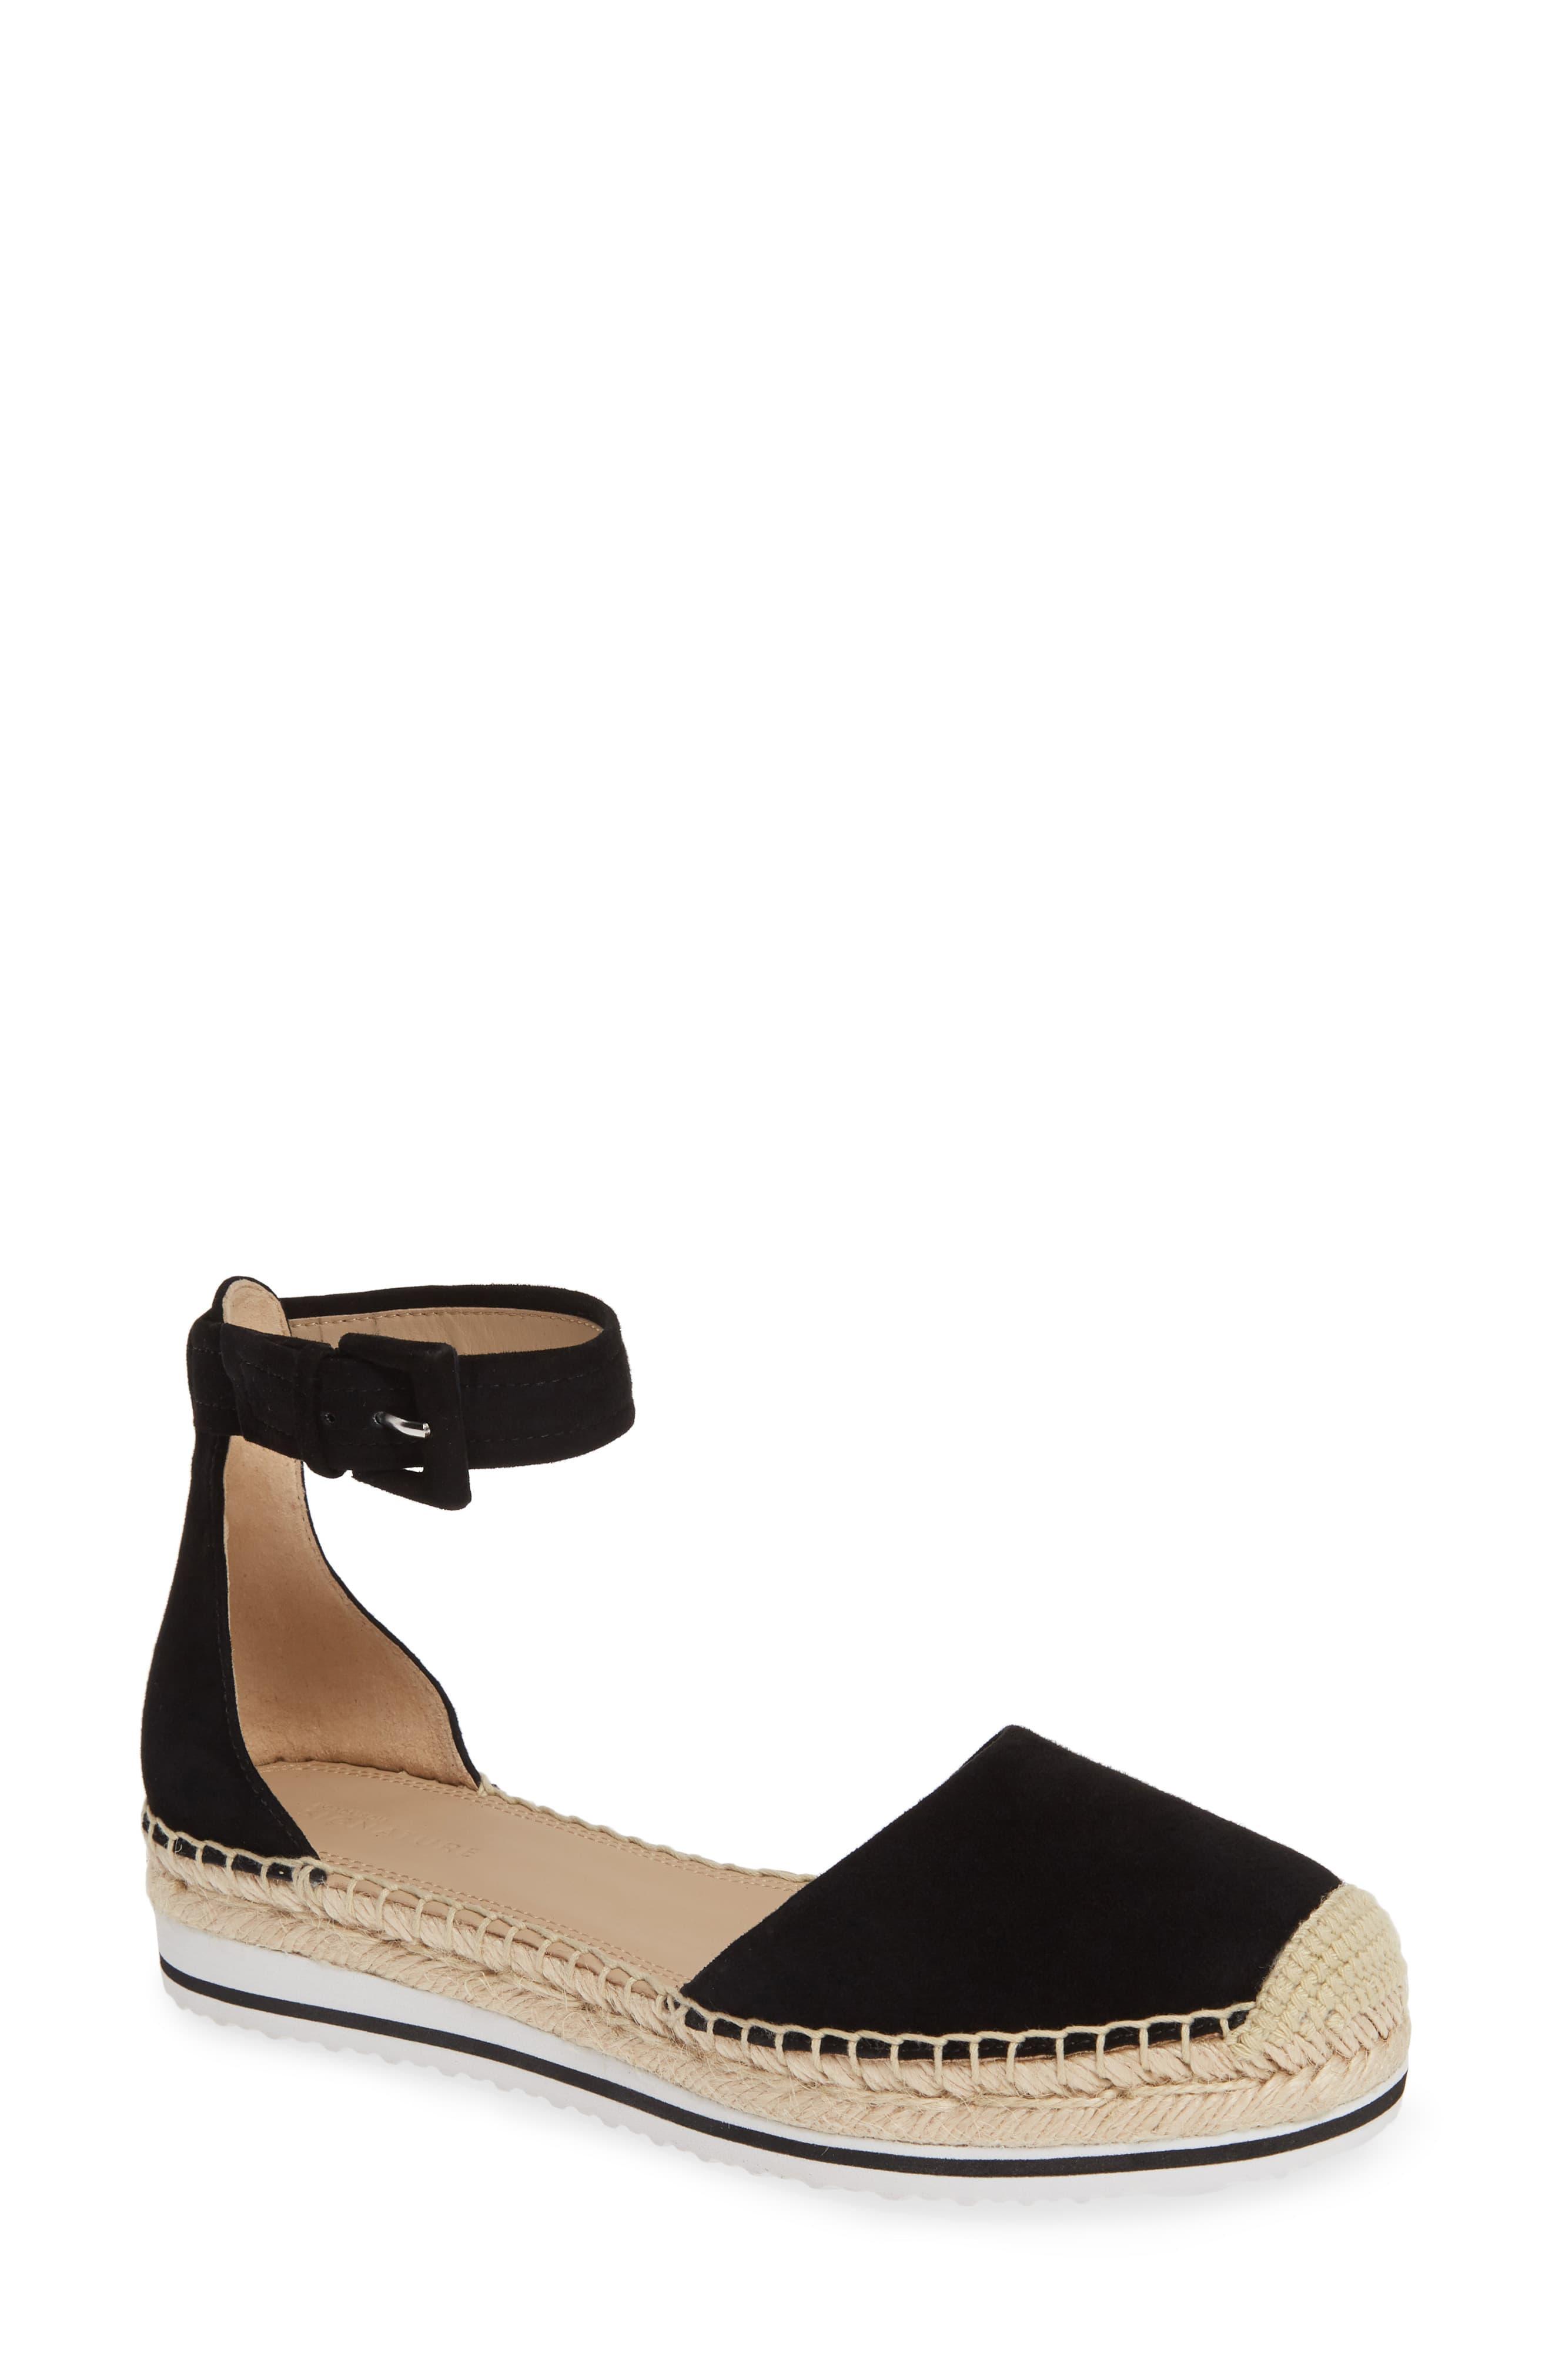 signature rosi flat espadrille sandal (women flat  photo video ds650 and kfx700 atvfan